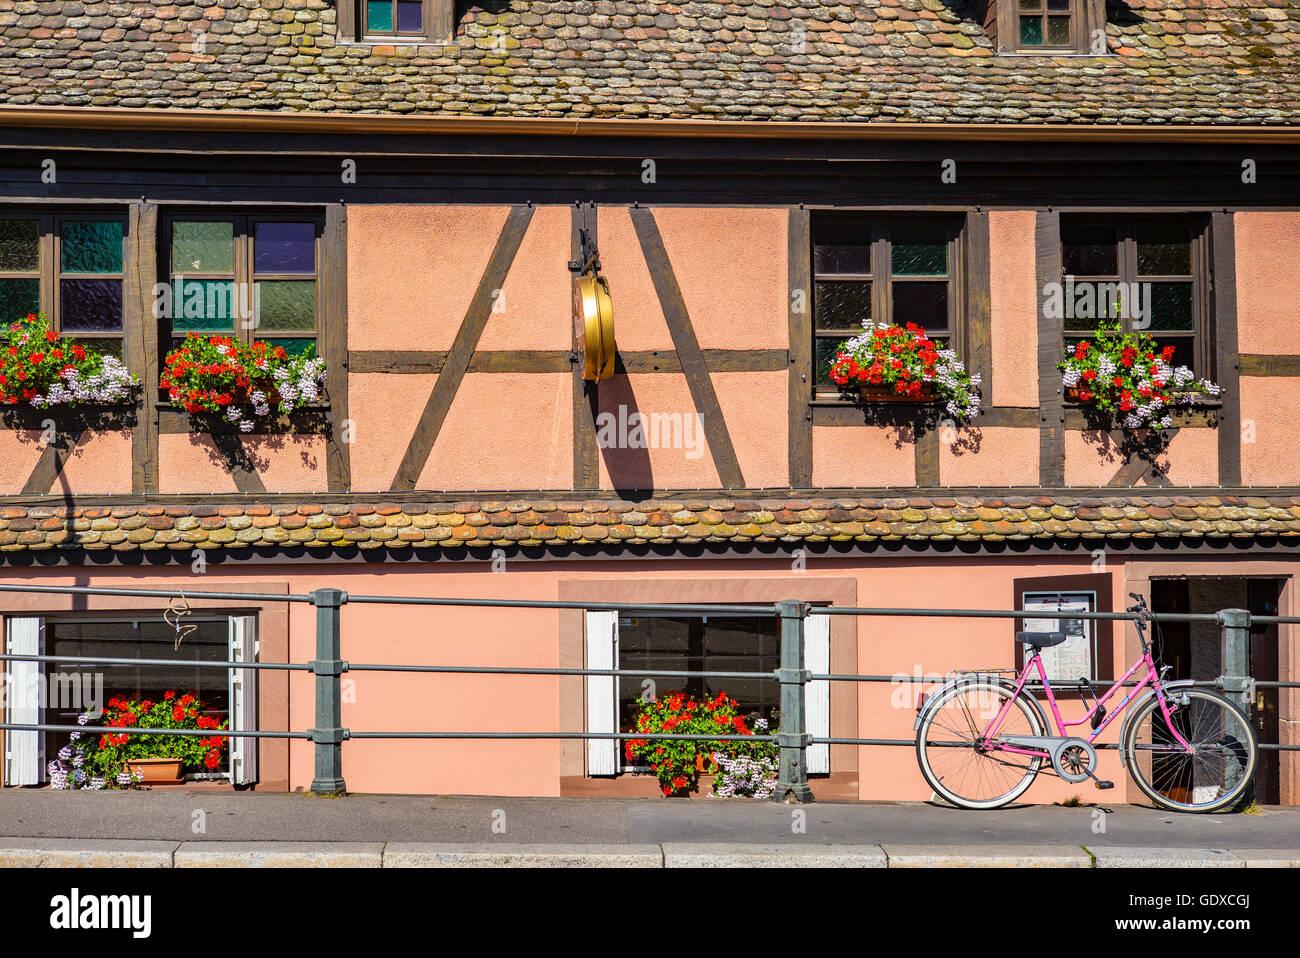 Half-timbered house, La Petite France, Strasbourg, Alsace, France - Stock Image